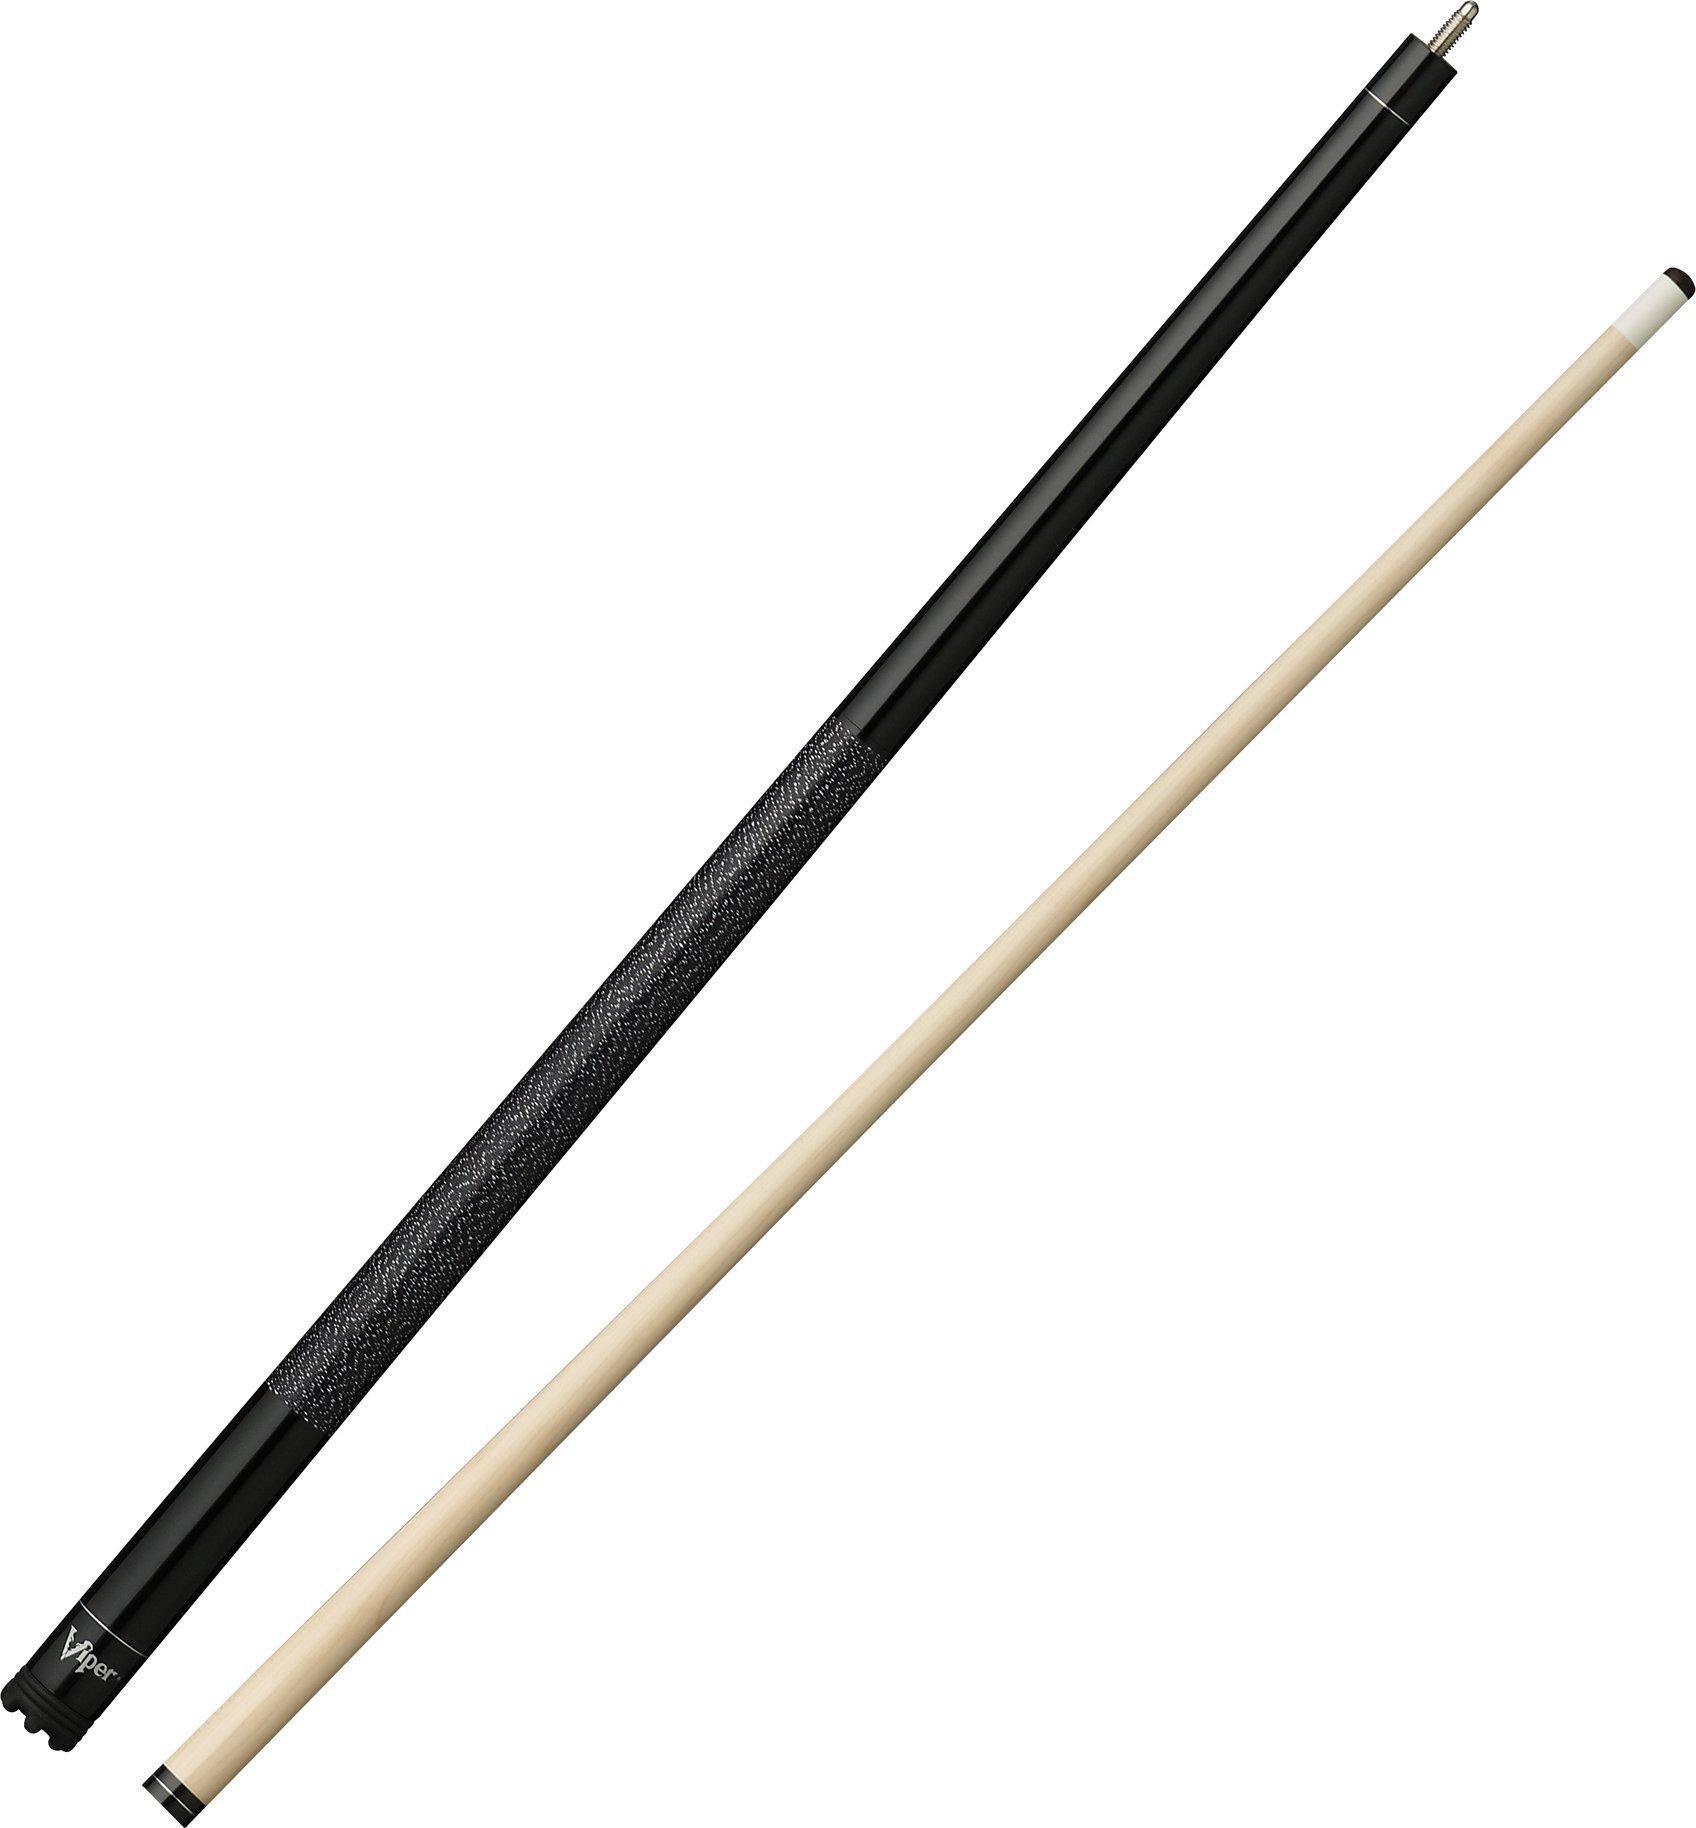 Viper Jump Shot/Break 58'' 3-Piece Billiard/Pool Cue, Black, 20 Ounce